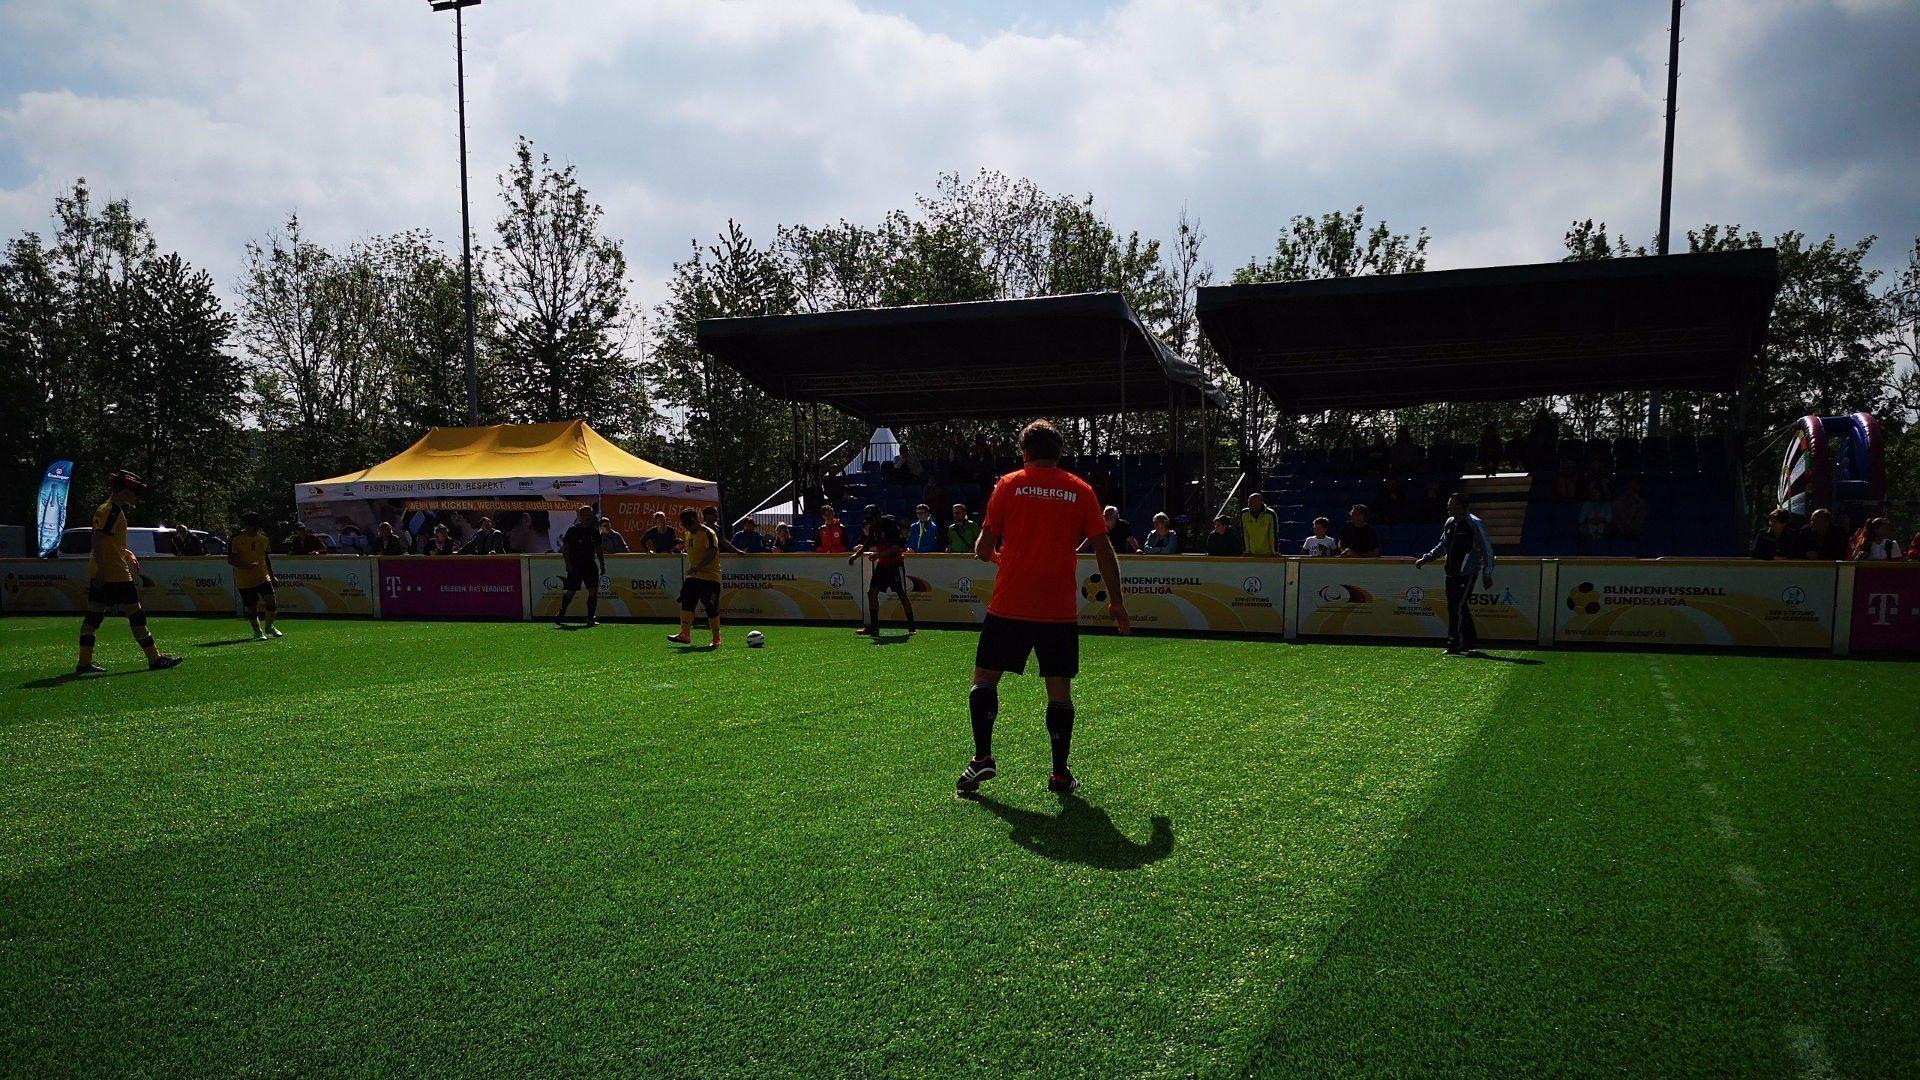 Dortmunder Spieler auf Platz vor leerer Tribüne